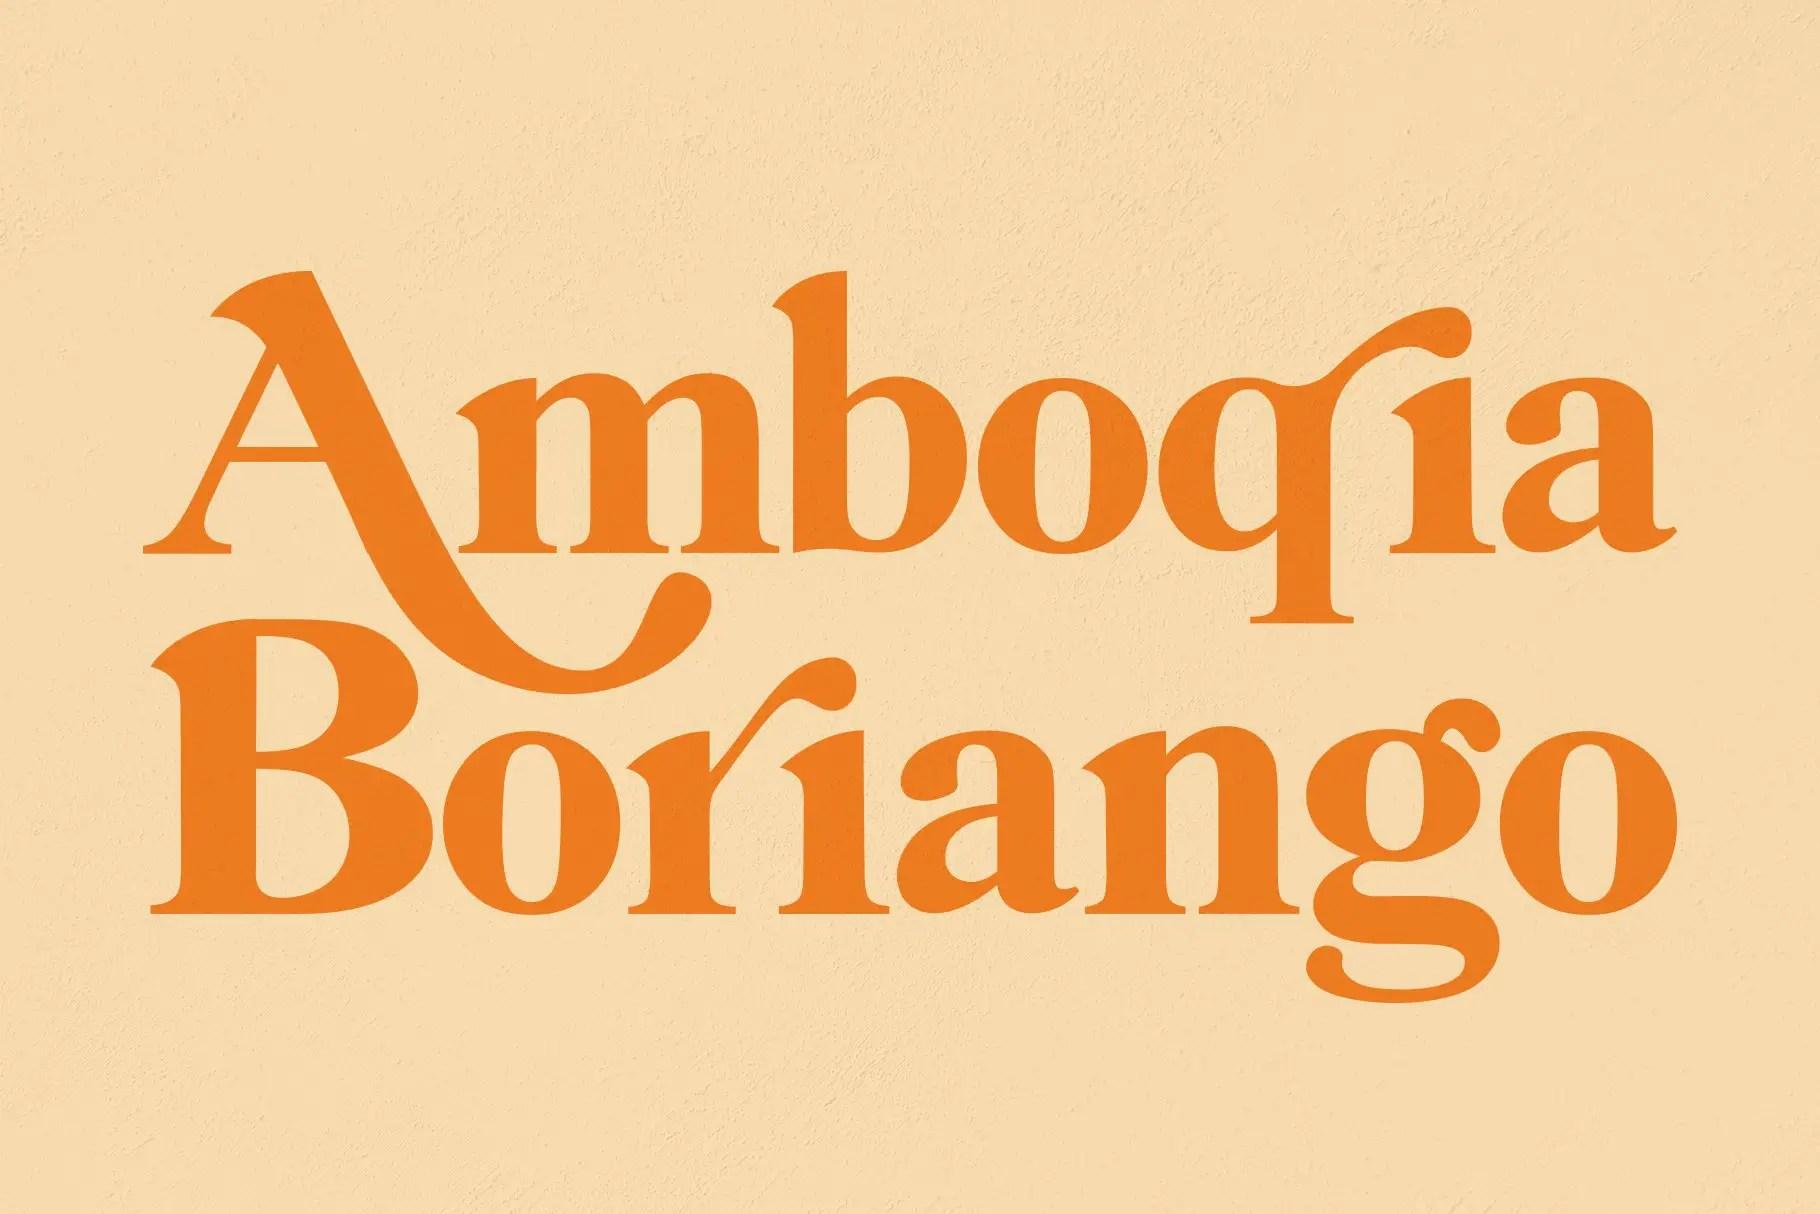 Amboqia Boriango Serif Display Font-1